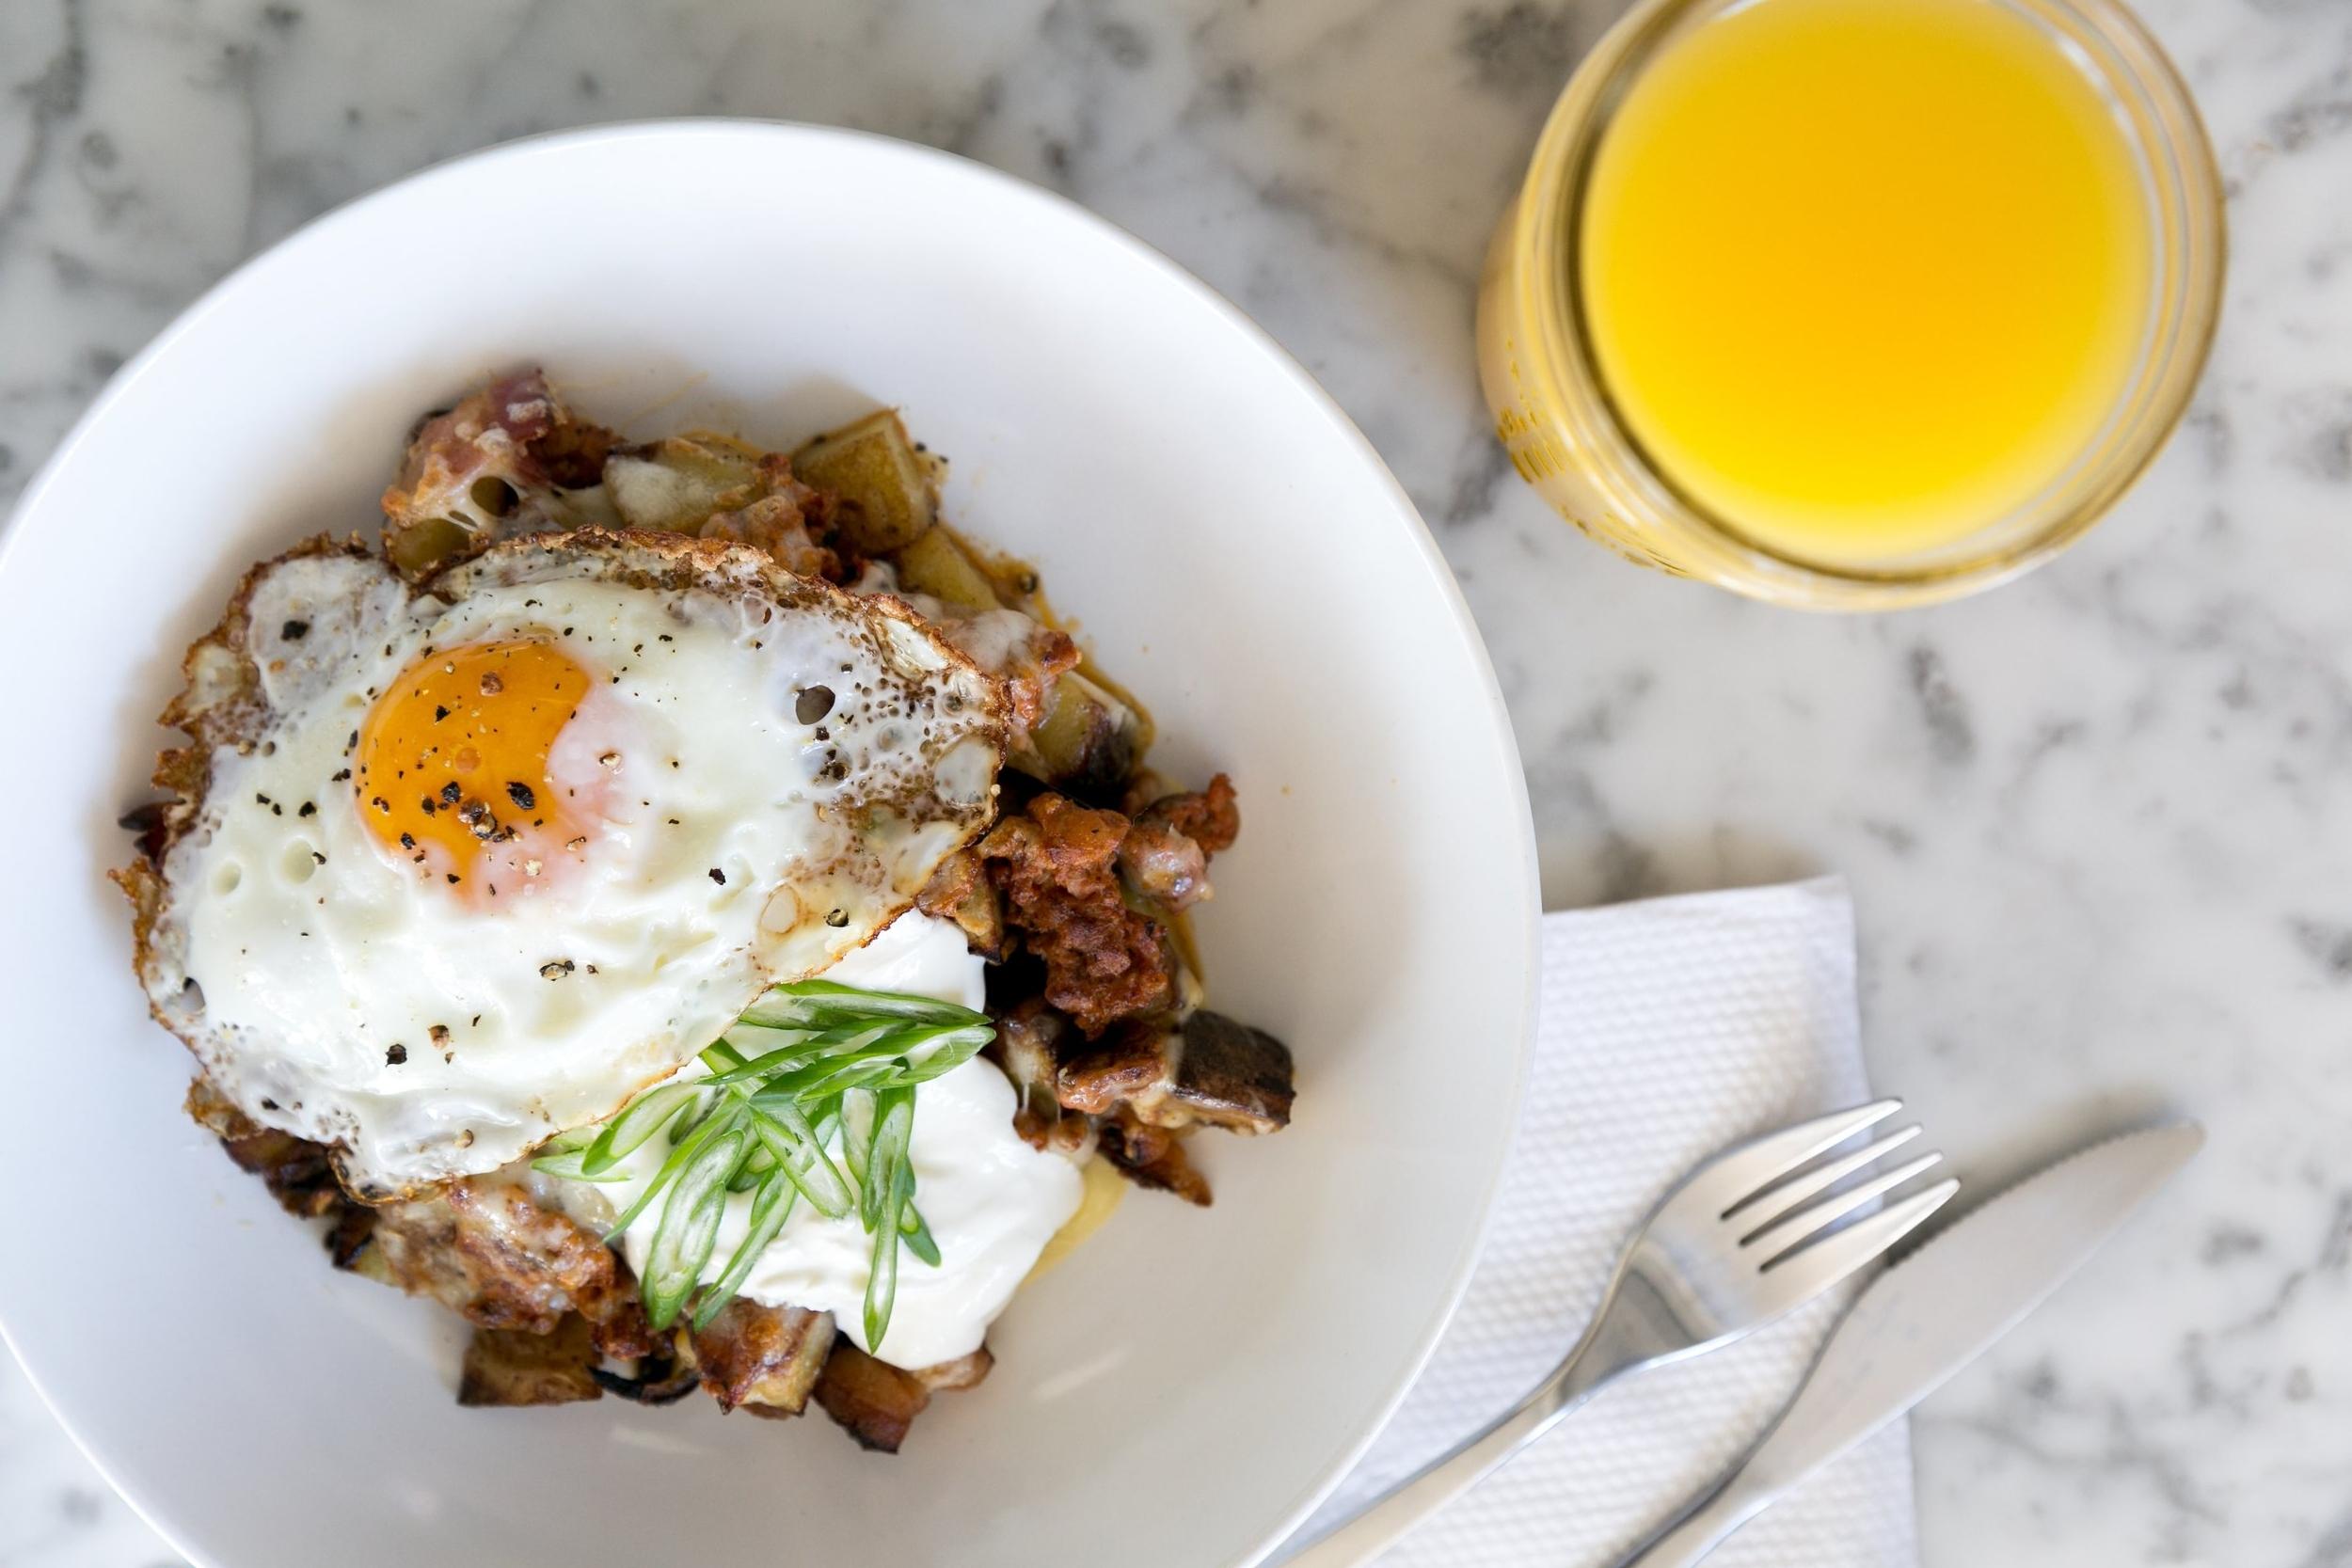 Rise_Mystic_Breakfast_Restaurant_CT_Eats_Out_Brunch.jpg